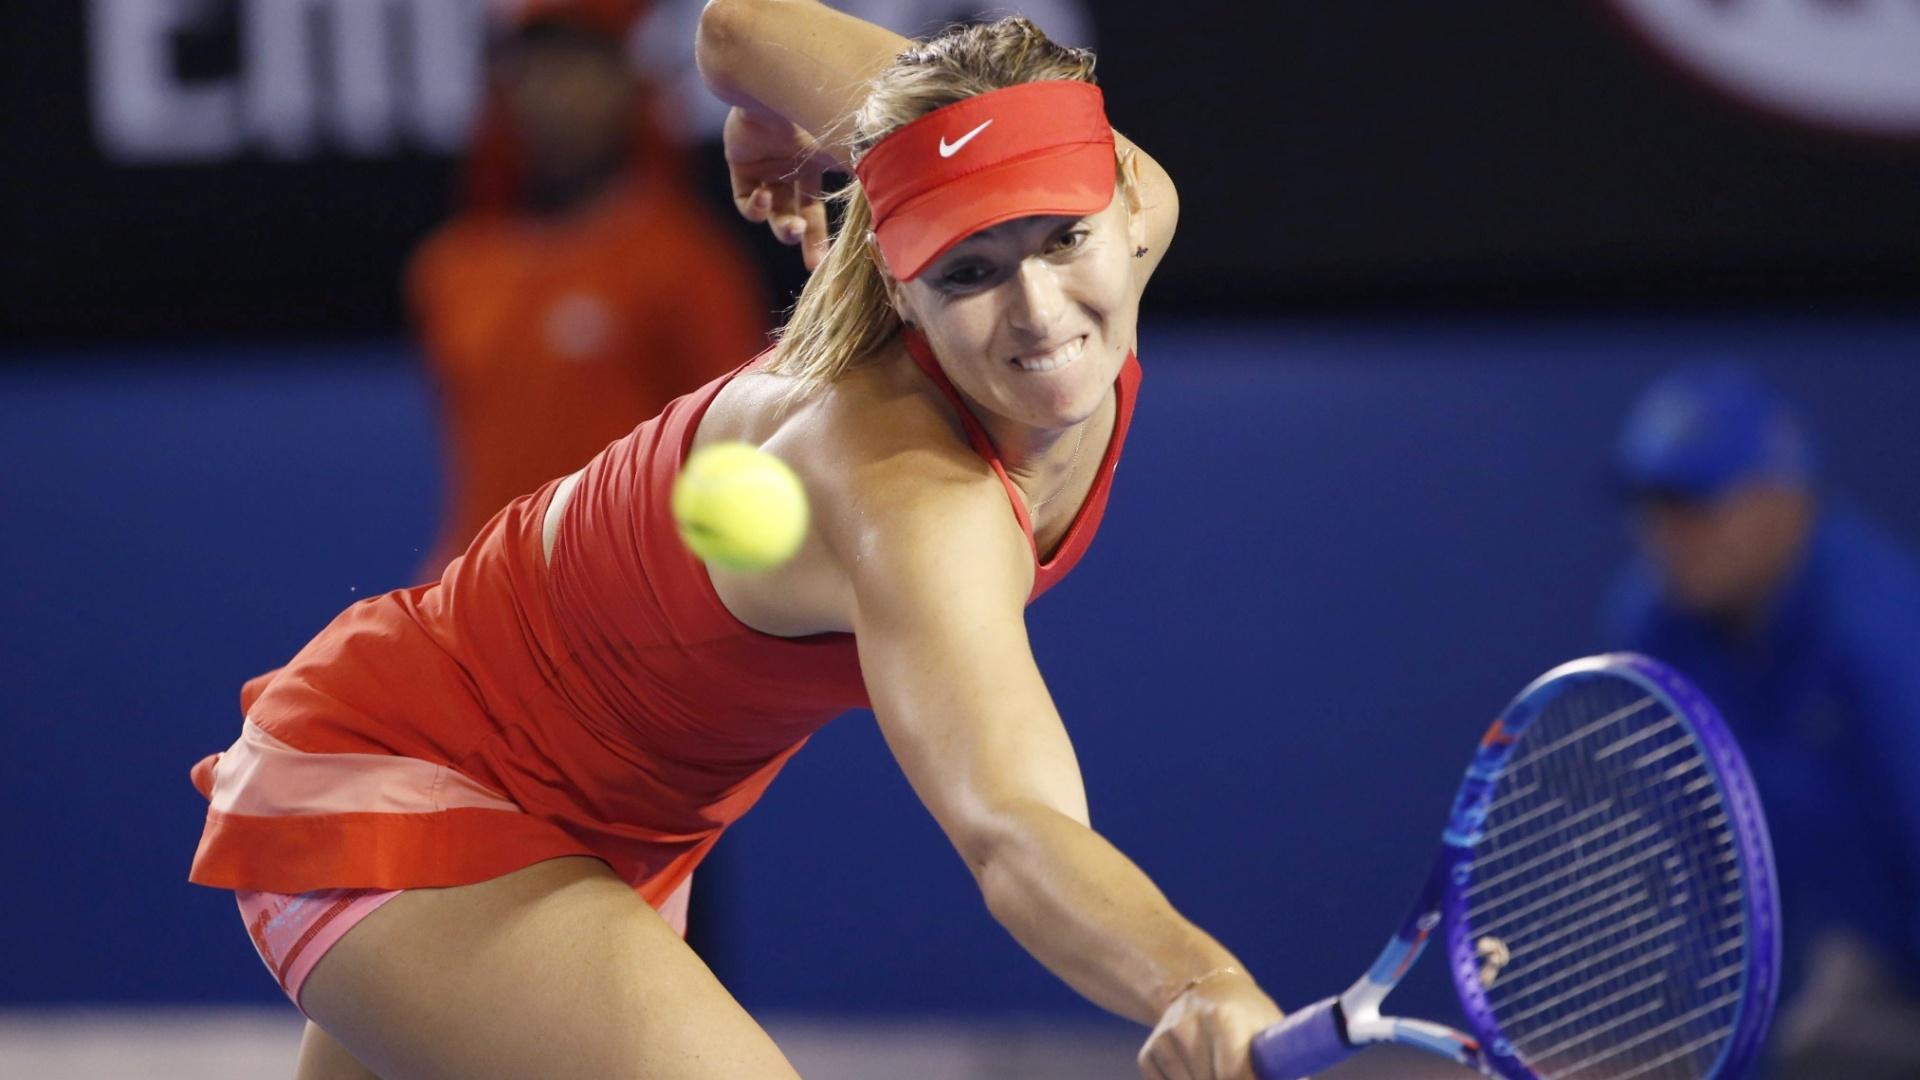 Sharapova faz malabarismo para devolver saque de Serena